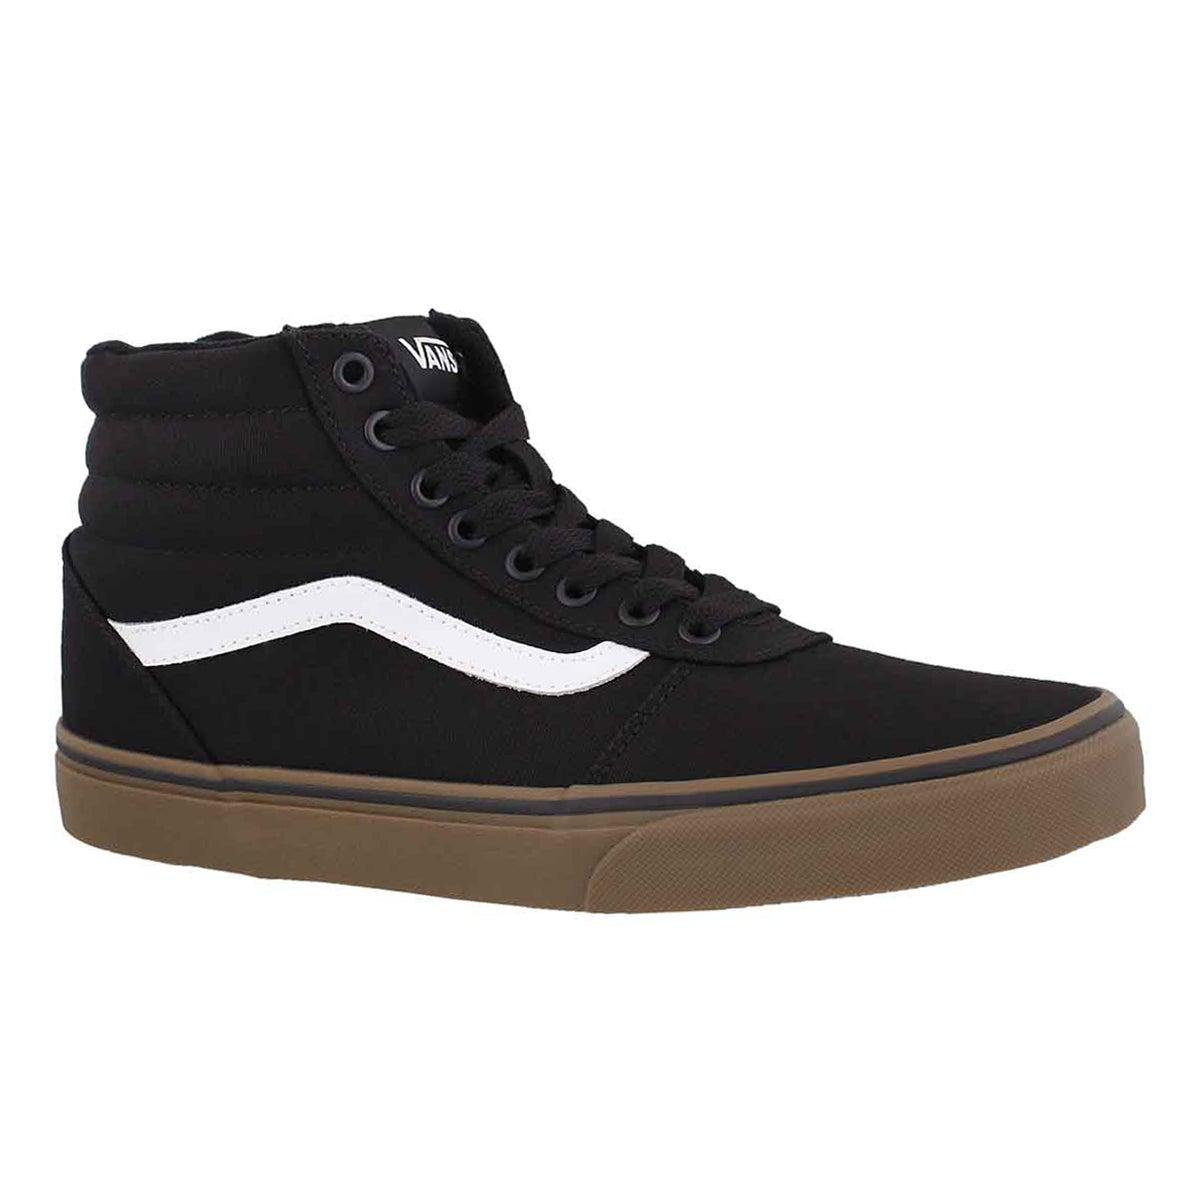 Men's WARD HI black/gum lace up sneakers